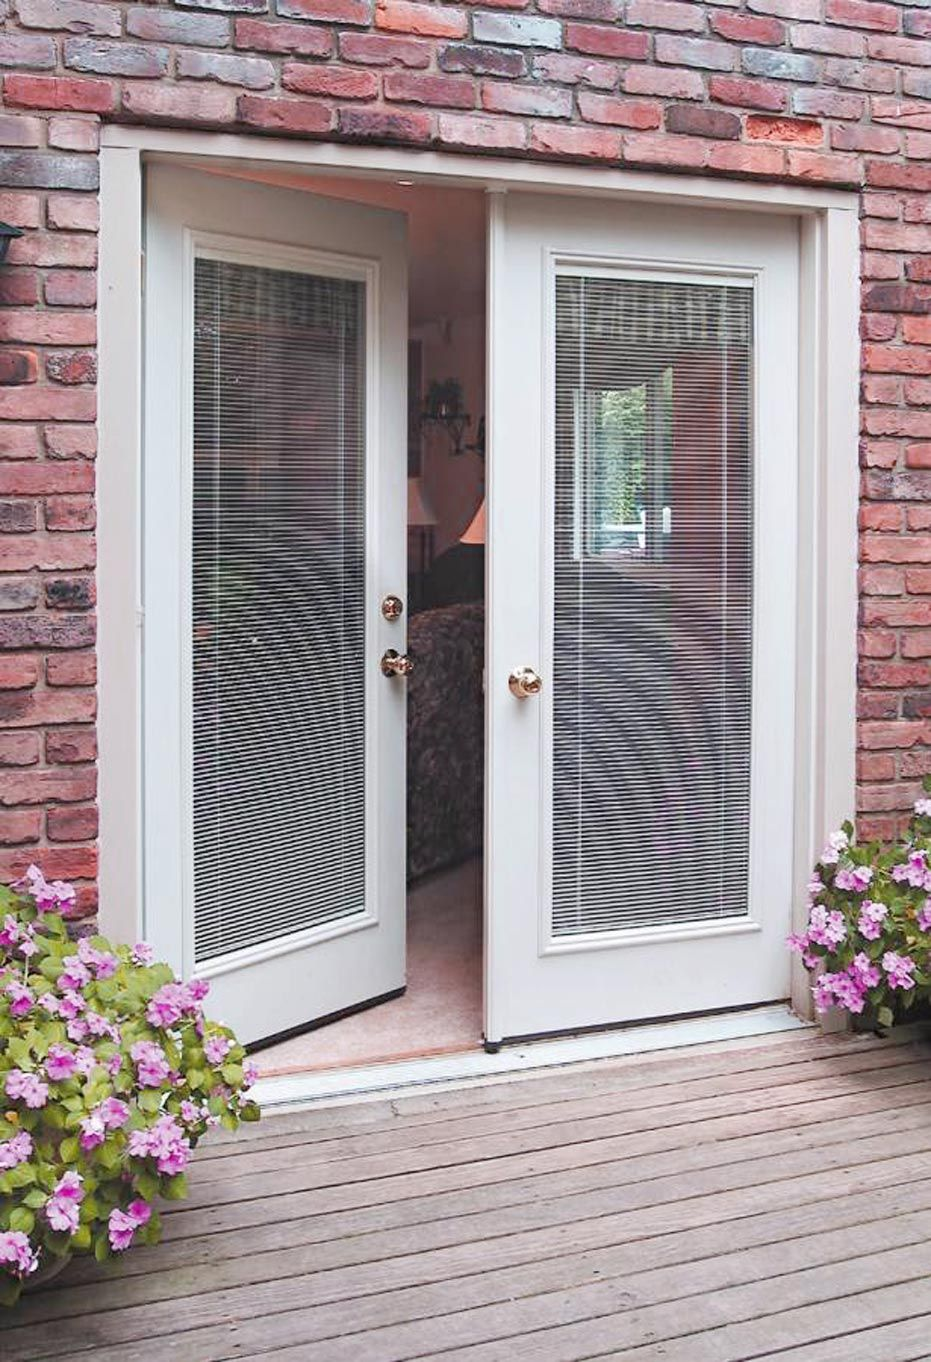 Patio Doors With Built In Blinds   Patio Doors Is A Door The Exterior Of  The House With The Inner Join ...   Stuff To Show Kerry   Pinterest   Patio  Doors, ...